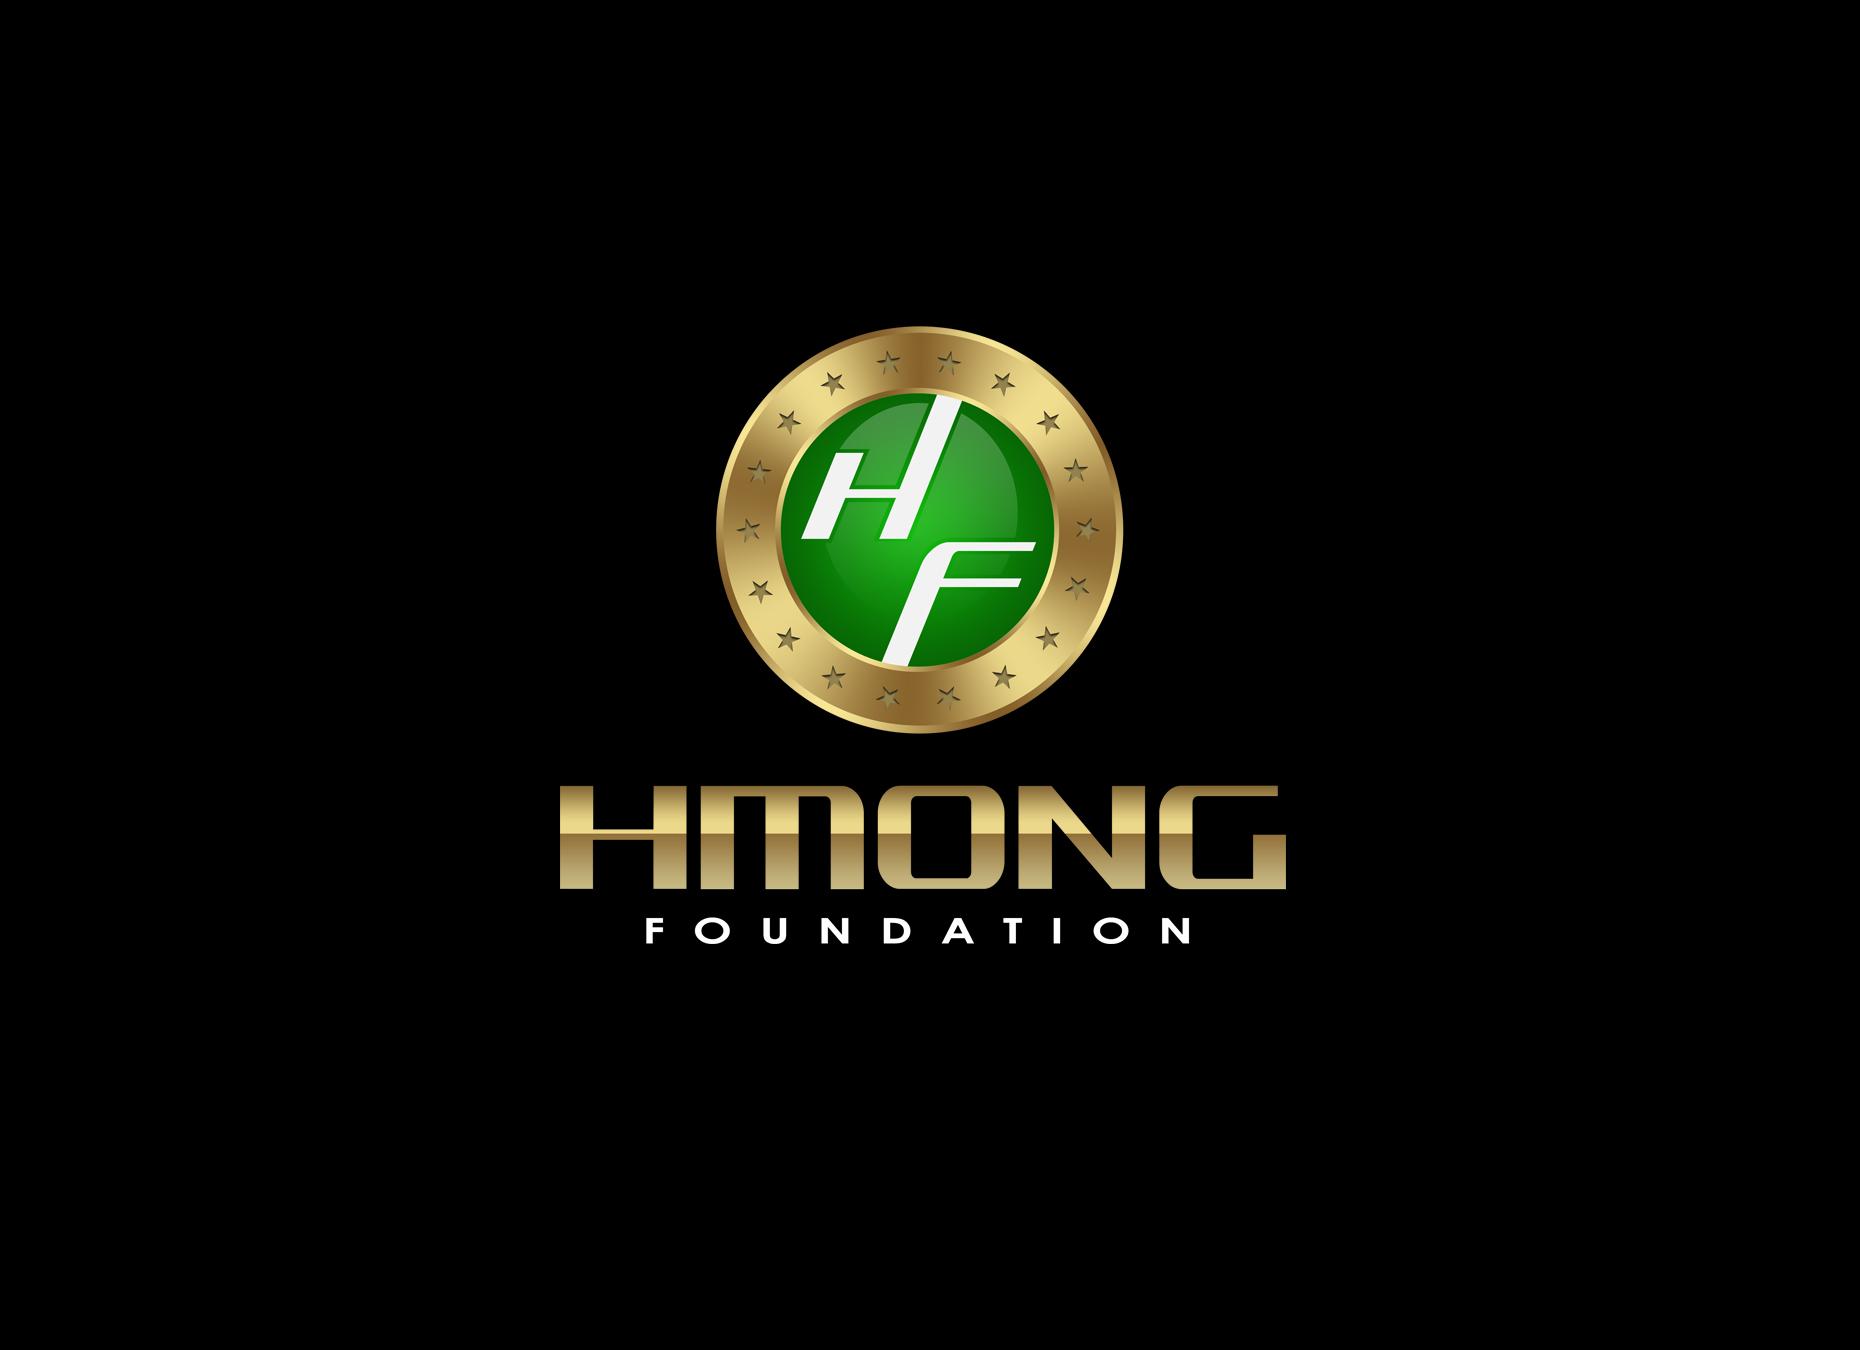 Logo Design by omARTist - Entry No. 91 in the Logo Design Contest Fun Logo Design for Hmong Foundation.